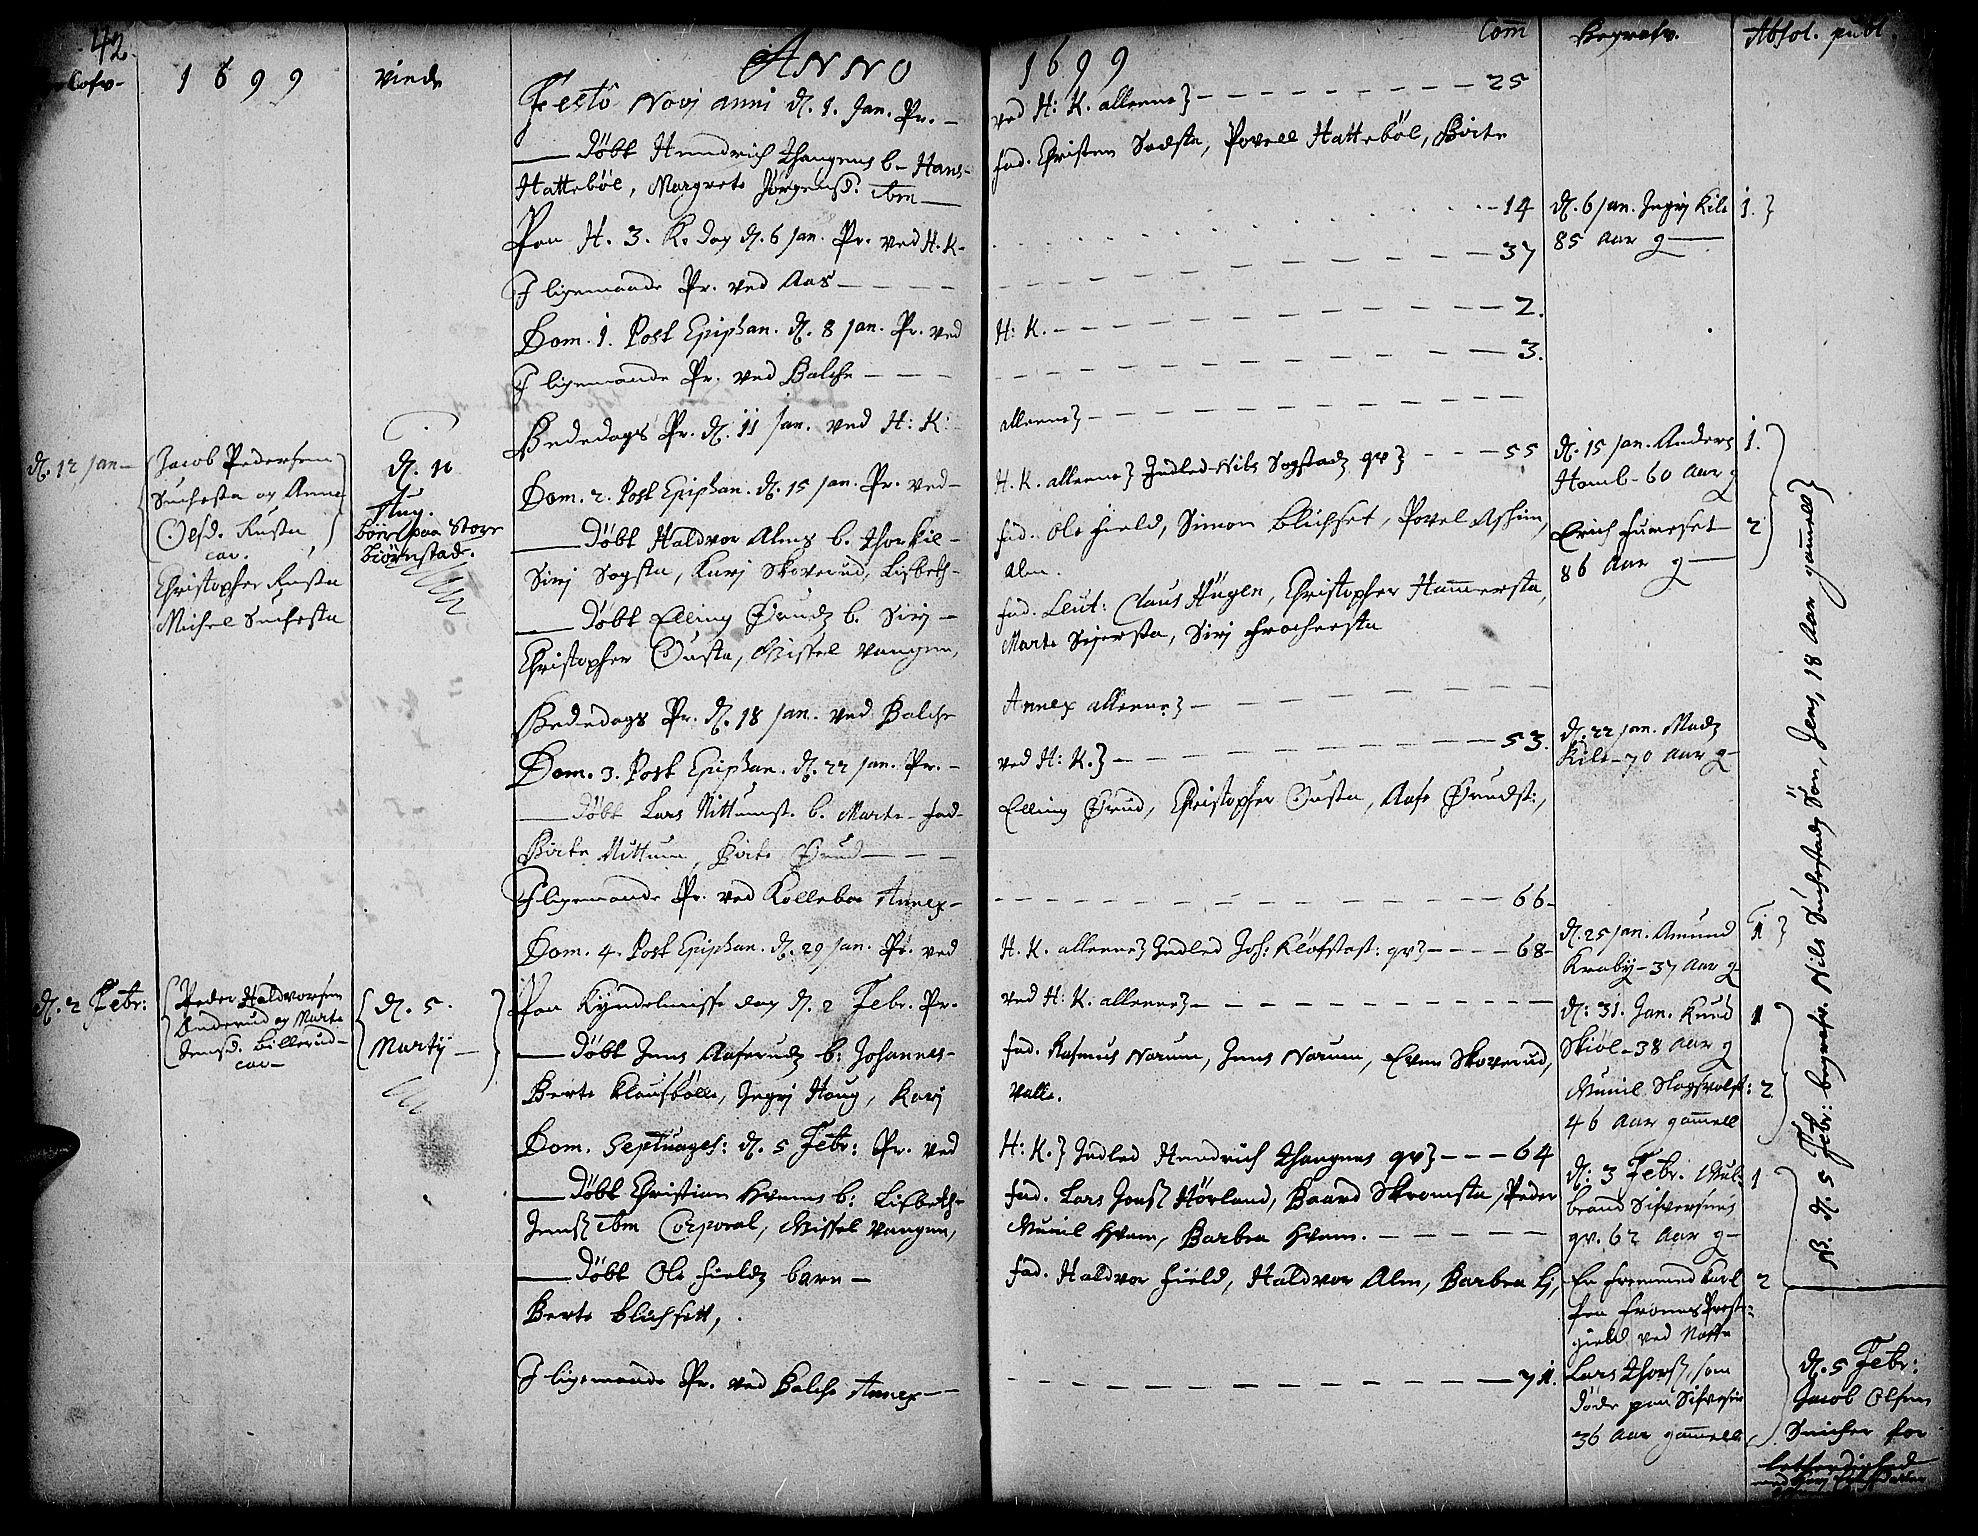 SAH, Toten prestekontor, Ministerialbok nr. 1, 1695-1713, s. 42